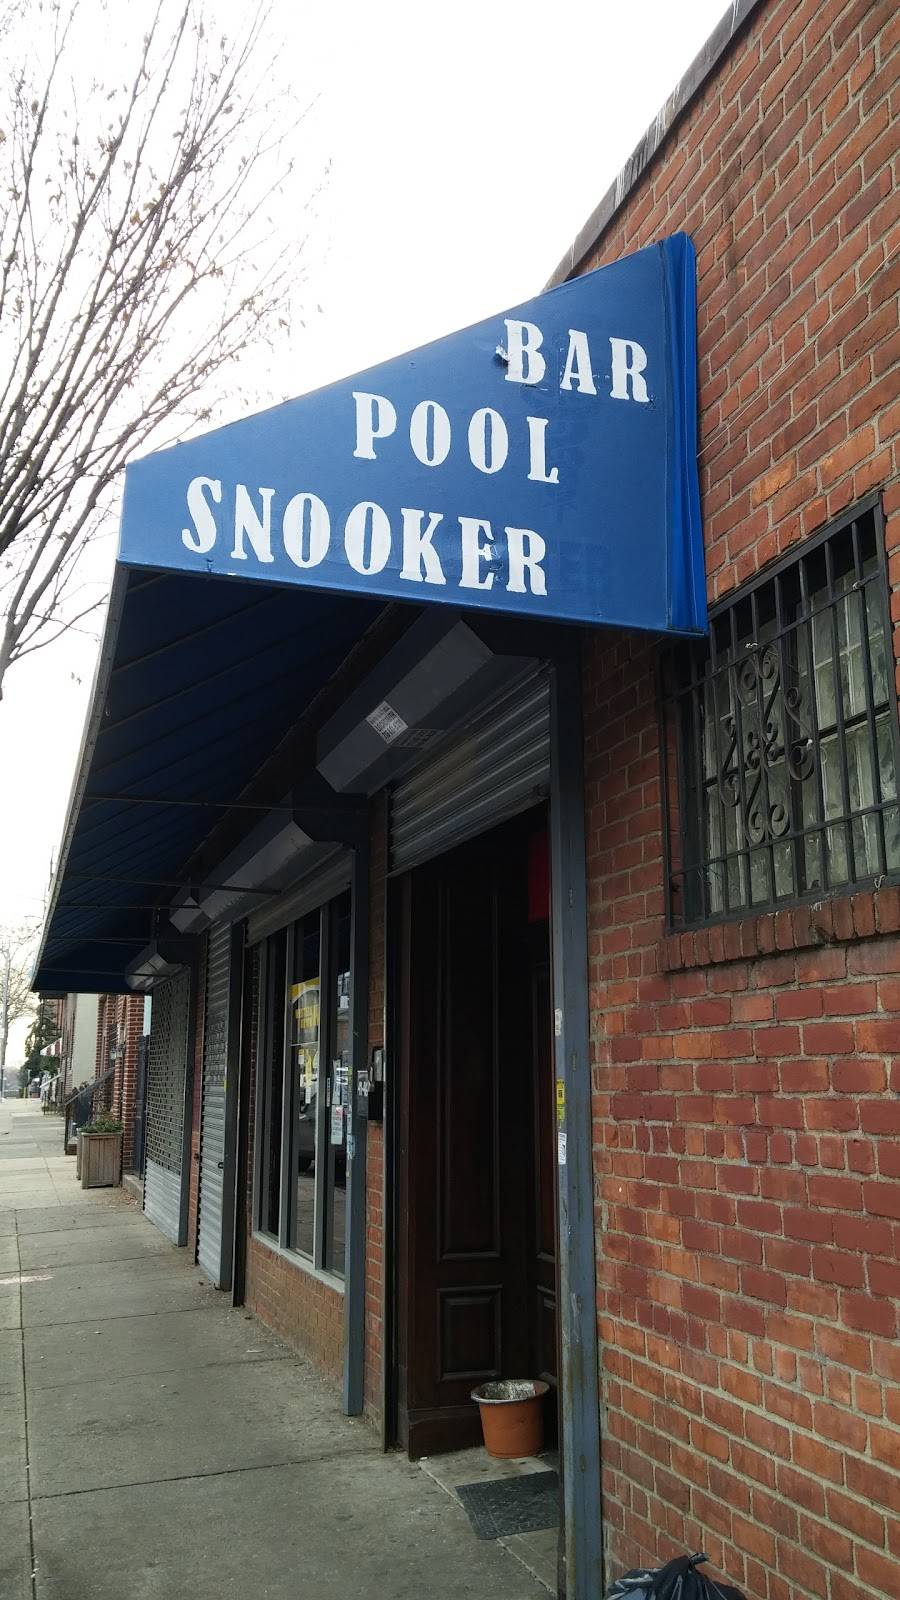 Weekender Billiard & Bar   restaurant   41-46 54th St, Woodside, NY 11377, USA   9178326903 OR +1 917-832-6903